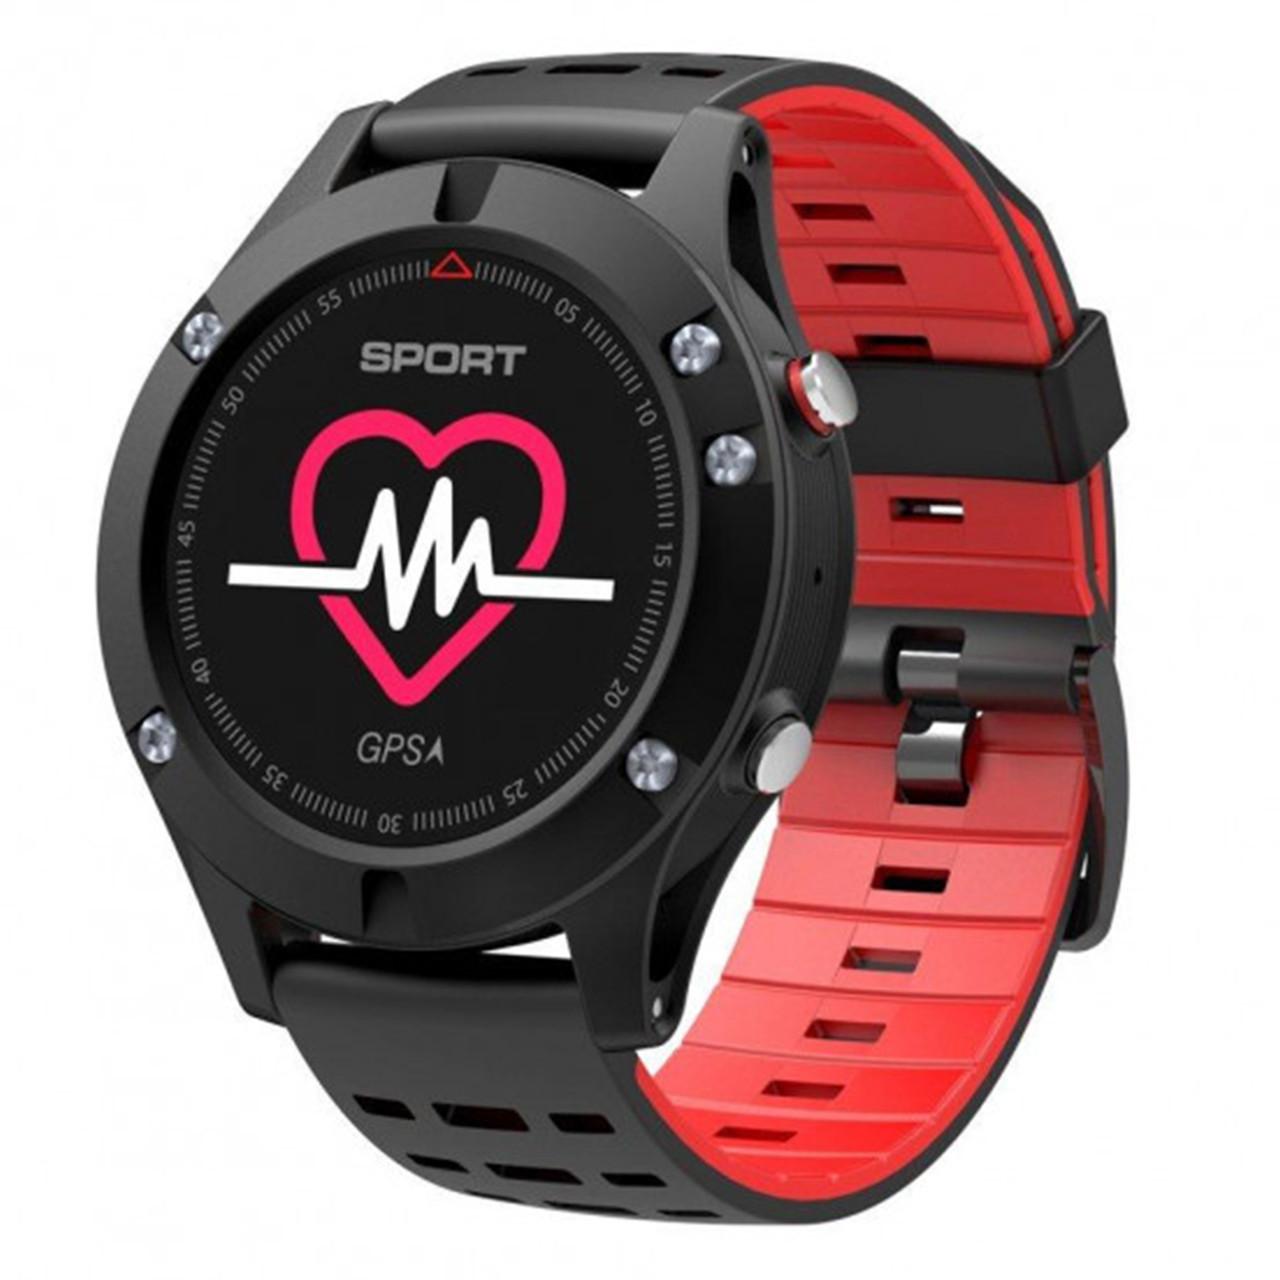 Мультиспортивные часы JETIX F5 с GPS трекером Black Red (2704977)